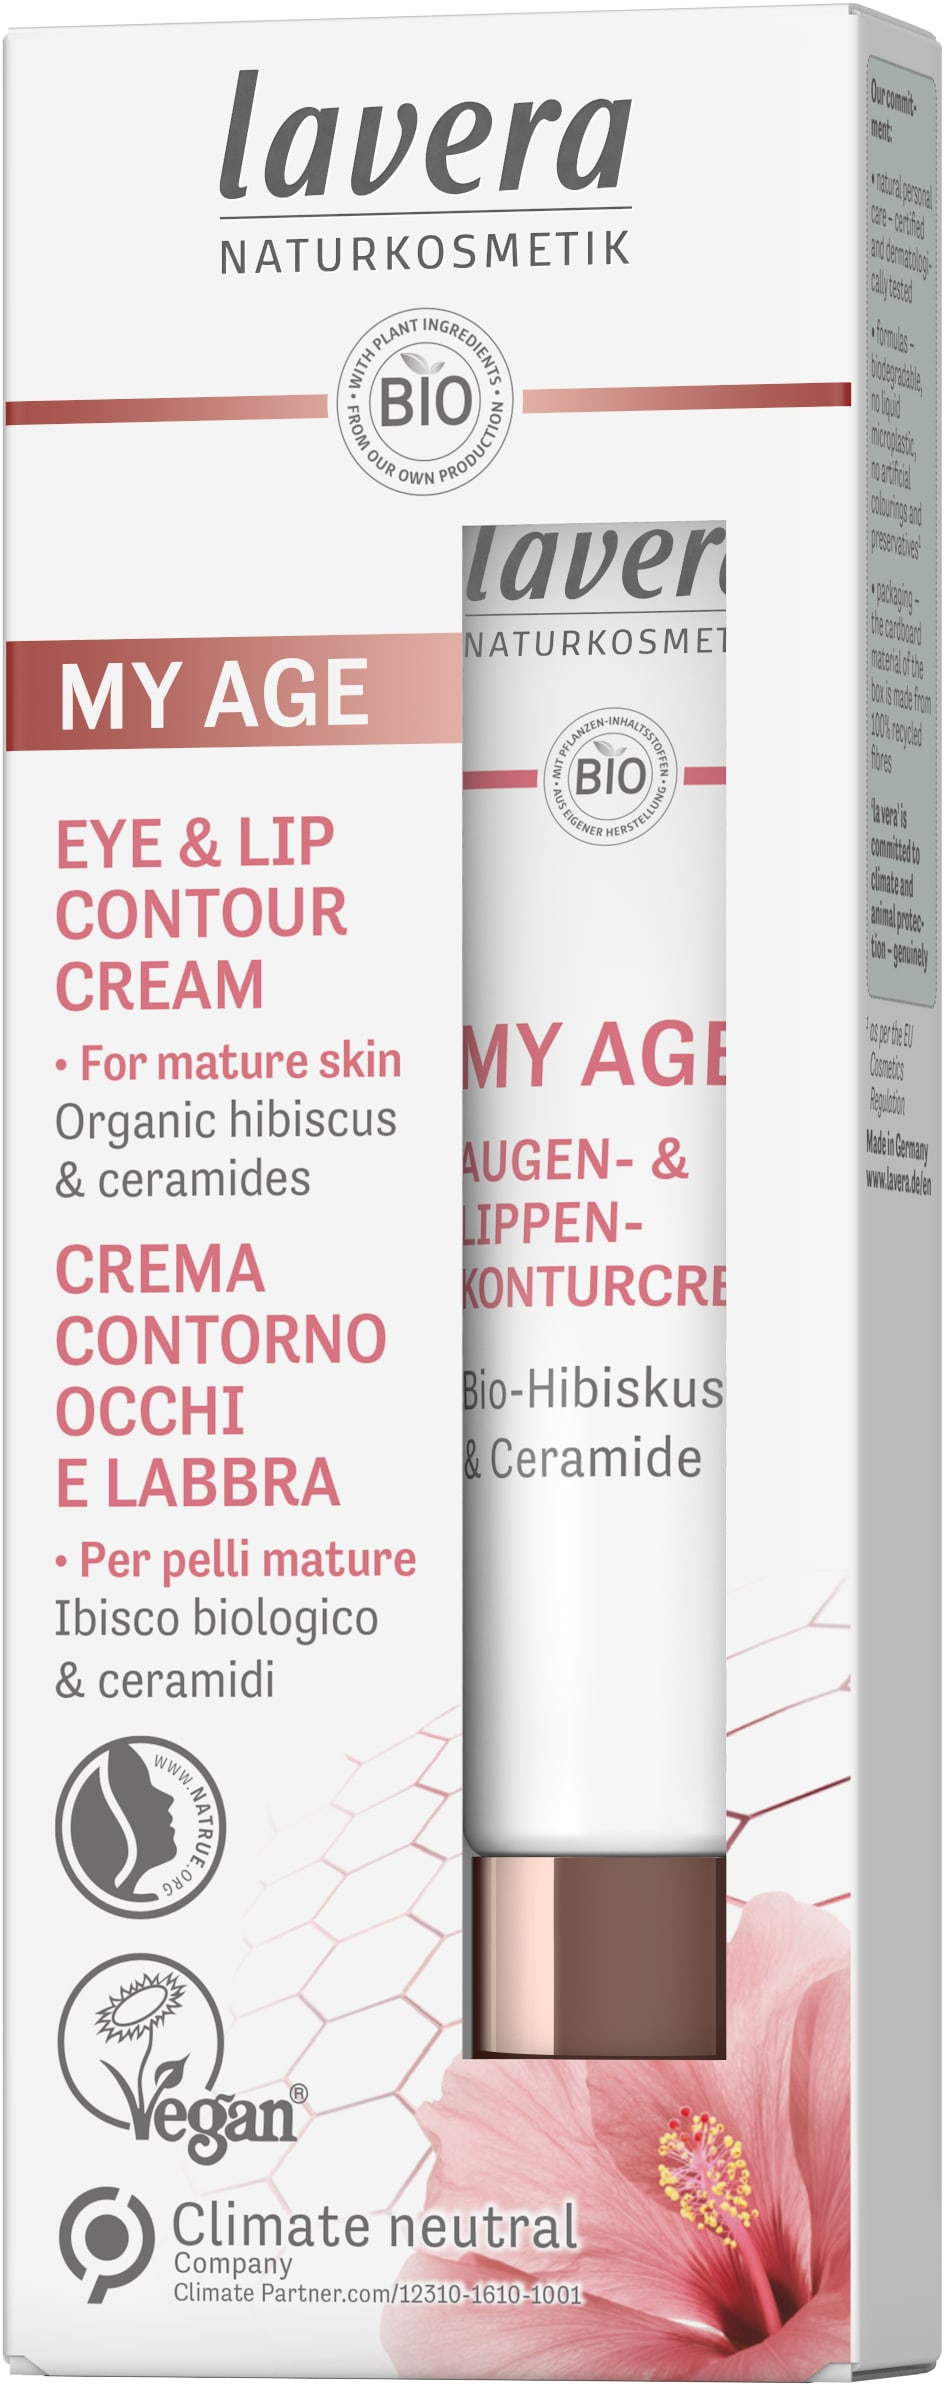 MY AGE Eye & Lip Contour Cream